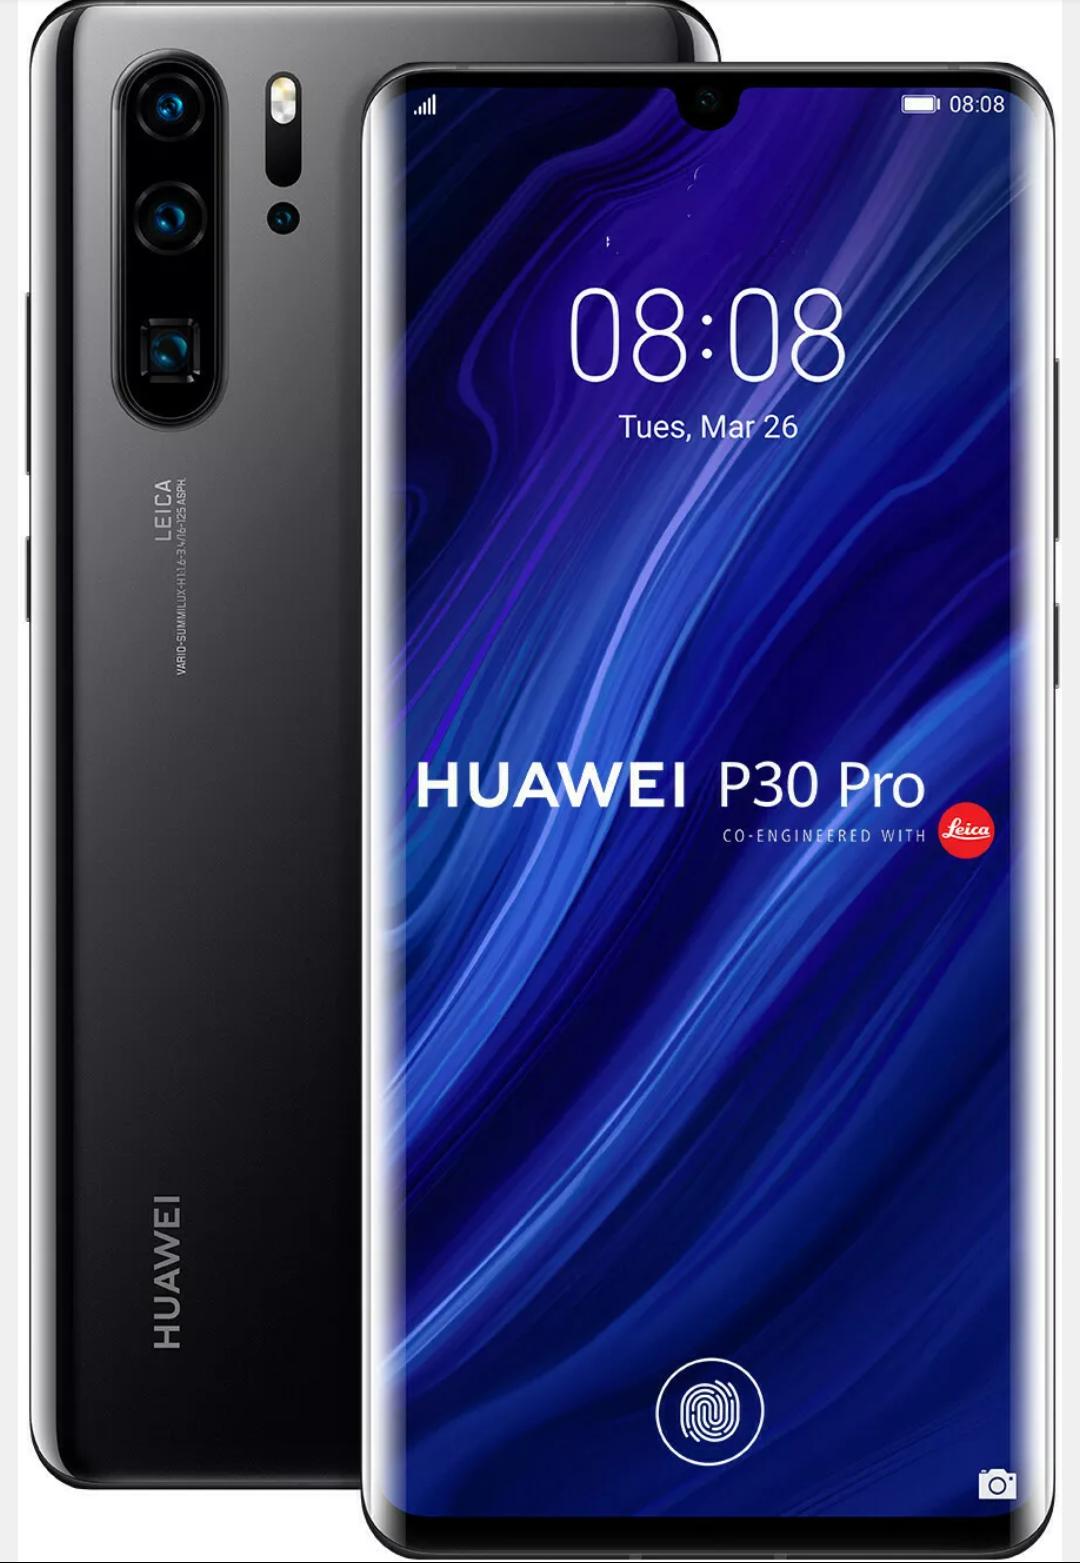 Huawei P30 Pro 128GB Black Schwarz Dual Sim Android Smartphone VOG-L29 NEU